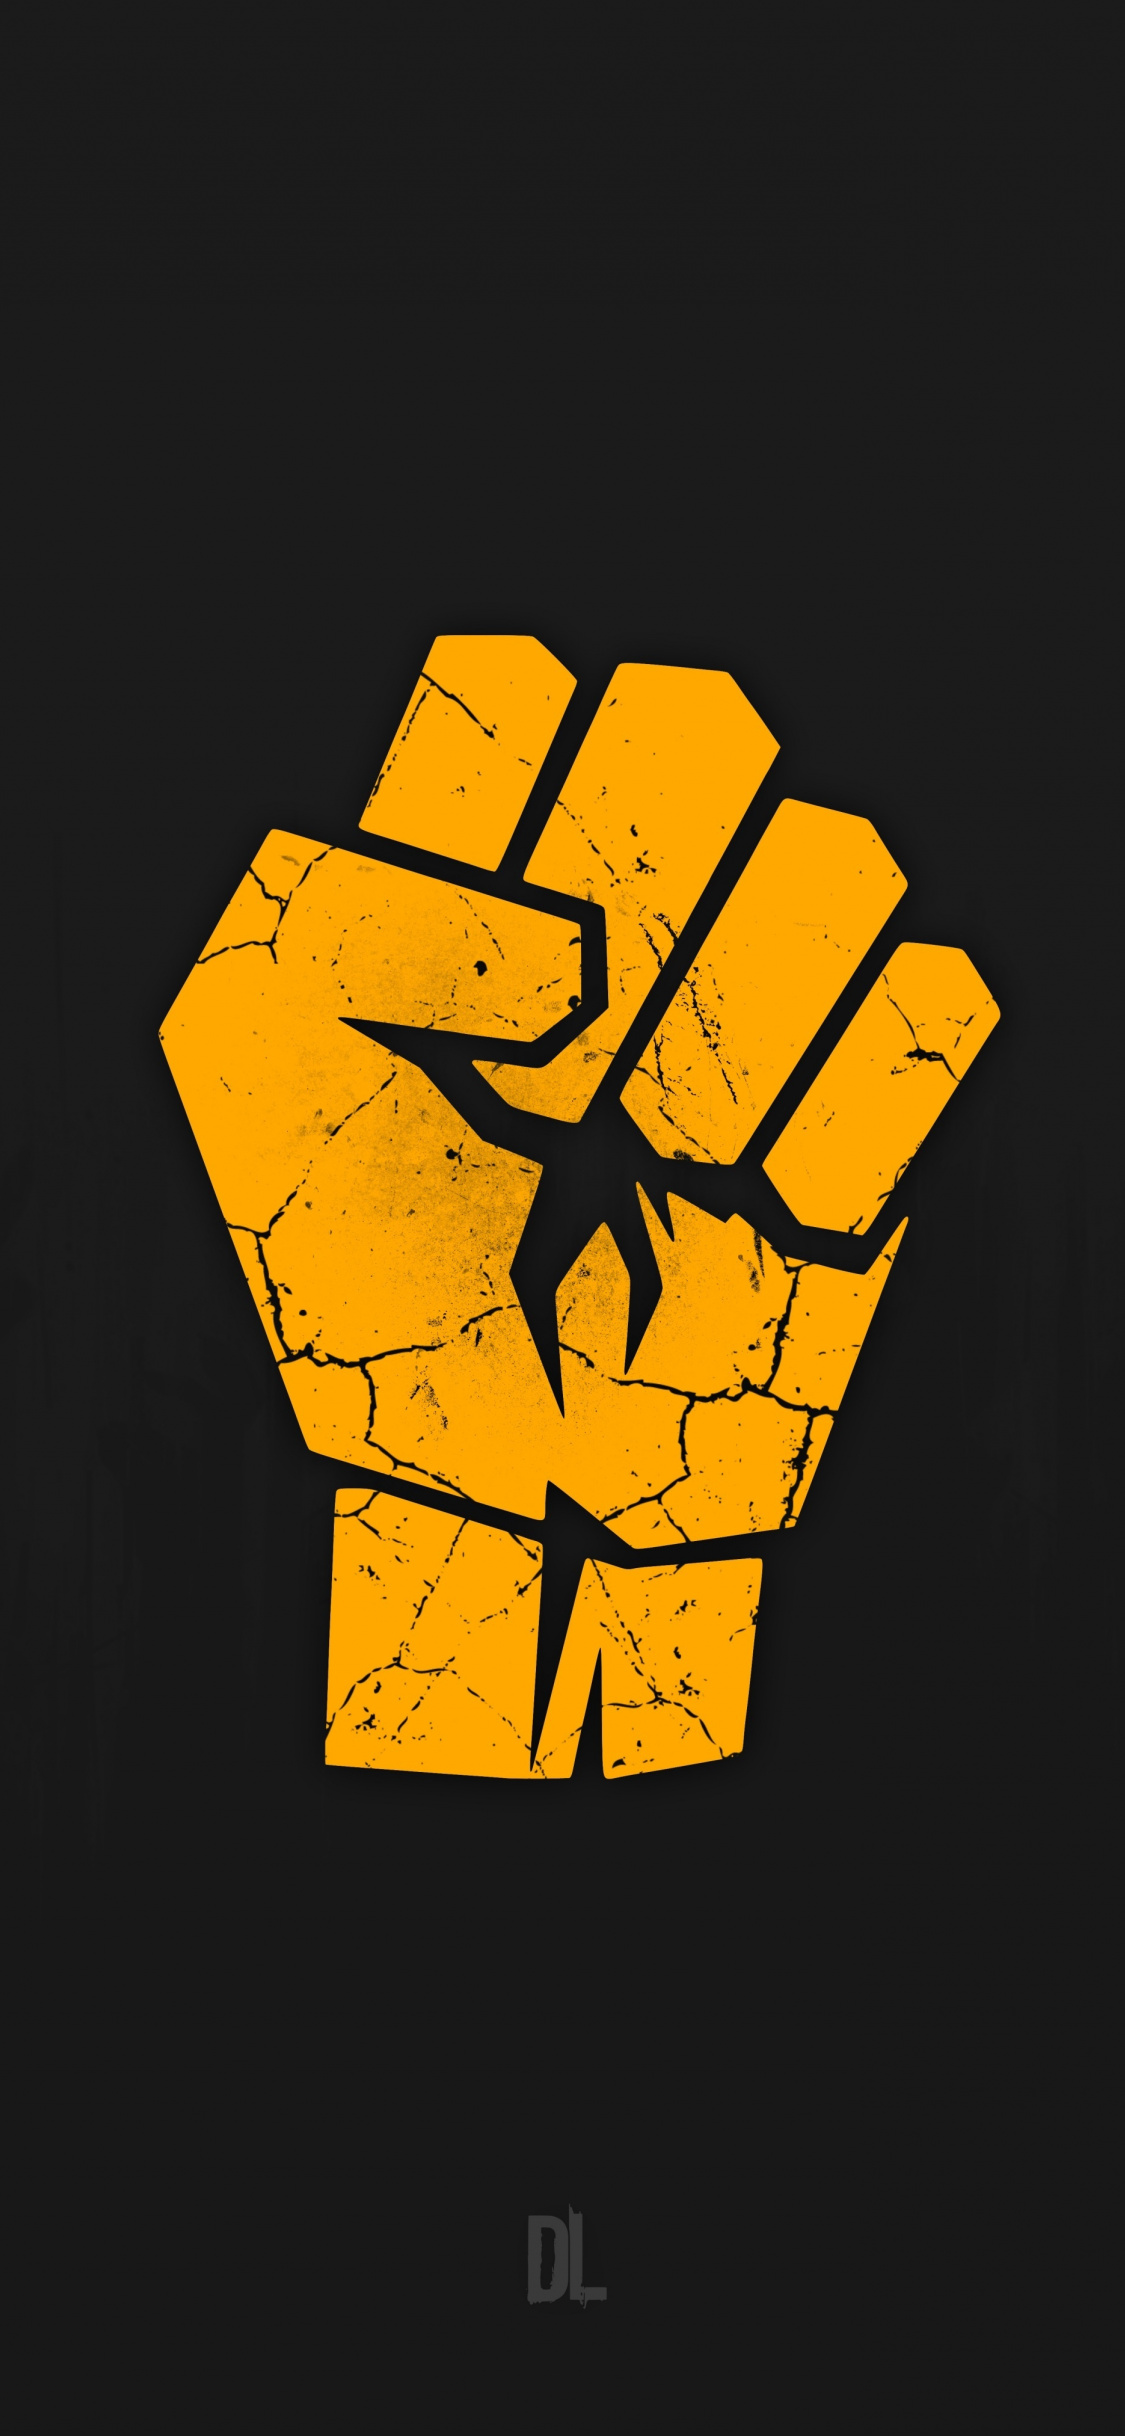 Fist Dying Light Video Game Minimal Wallpaper Gaming Minimalist Wallpaper 4k 1125x2436 Wallpaper Teahub Io